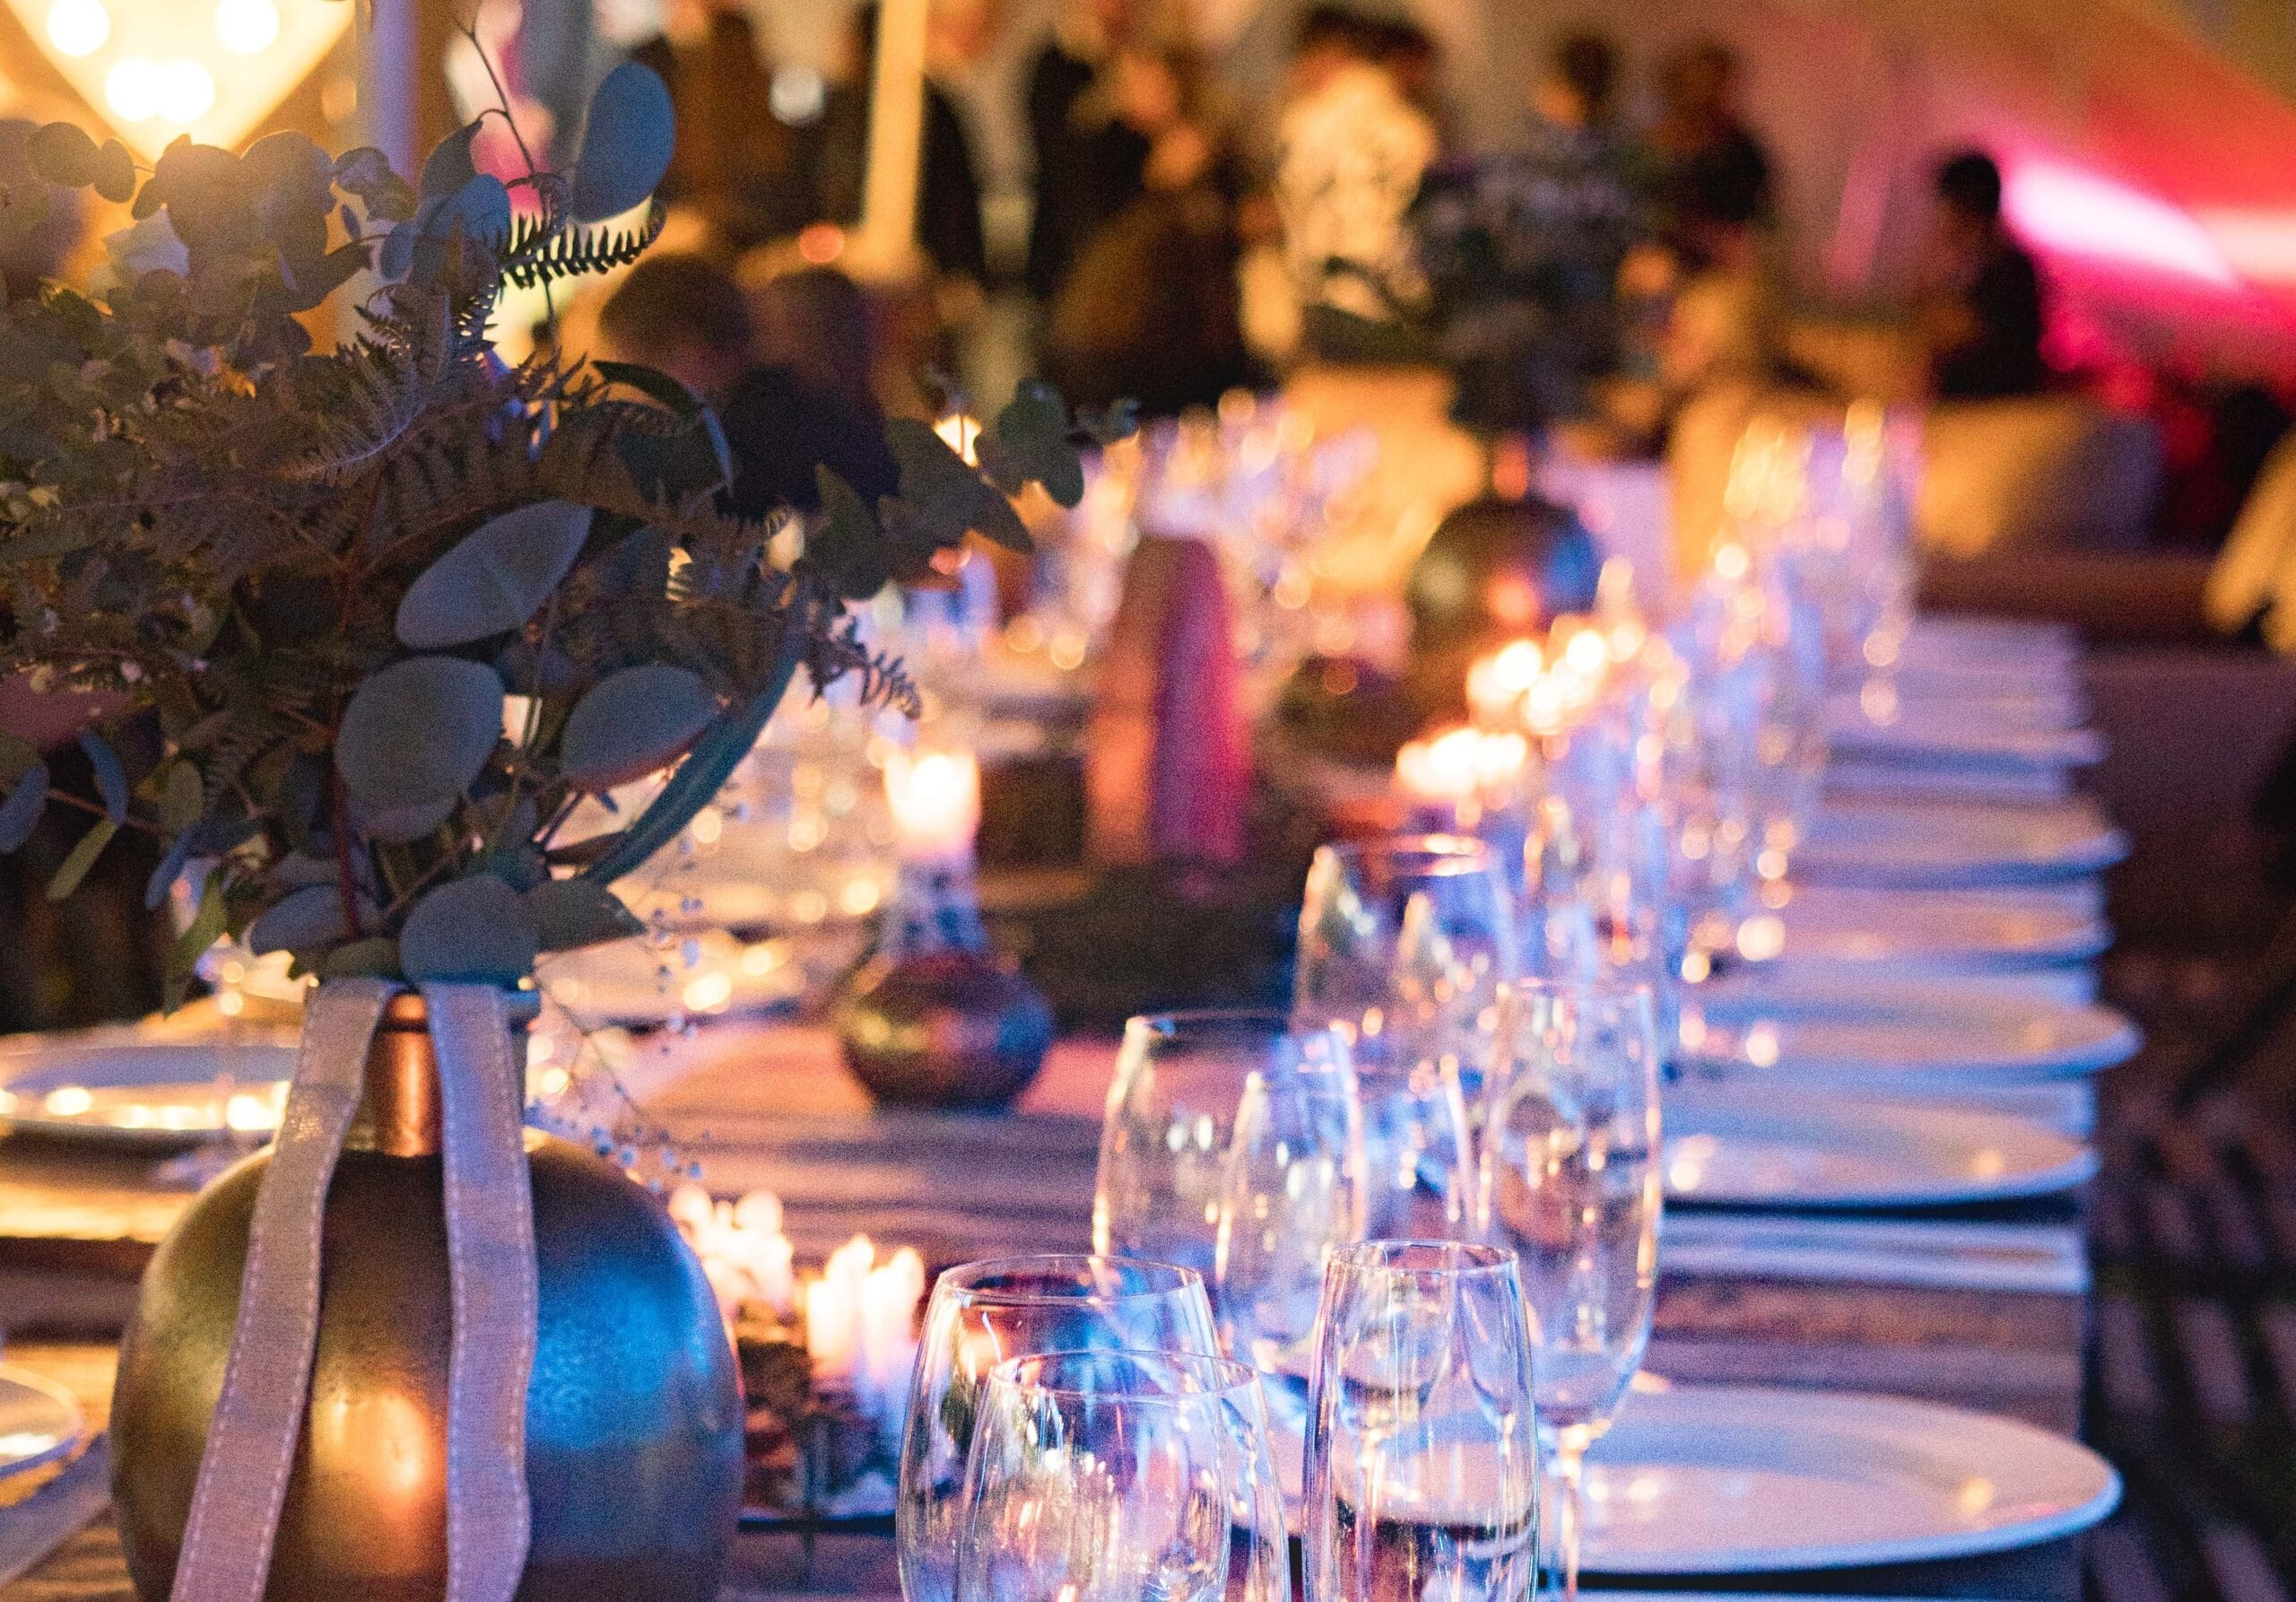 Classy dinner table